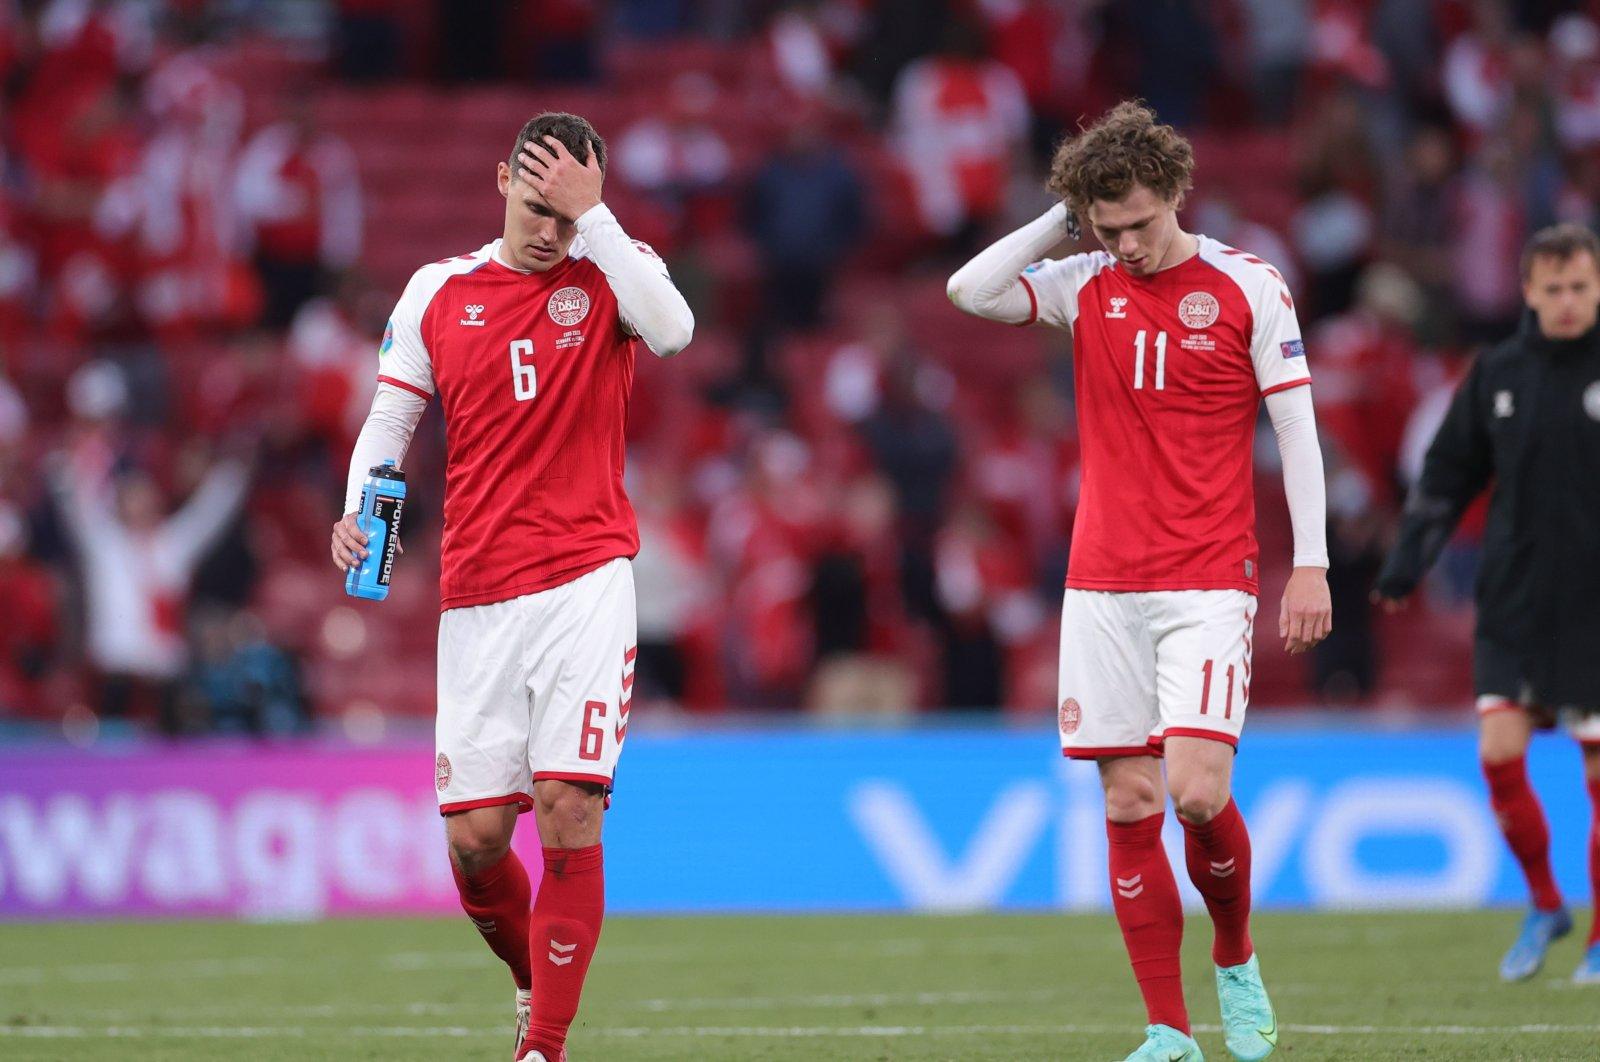 Denmark's Andreas Christensen (L) and Andreas Skov Olsen look dejected after the Euro 2020 match against Finland at Parken Stadium in Copenhagen, Denmark, June 12, 2021. (Reuters Photo)